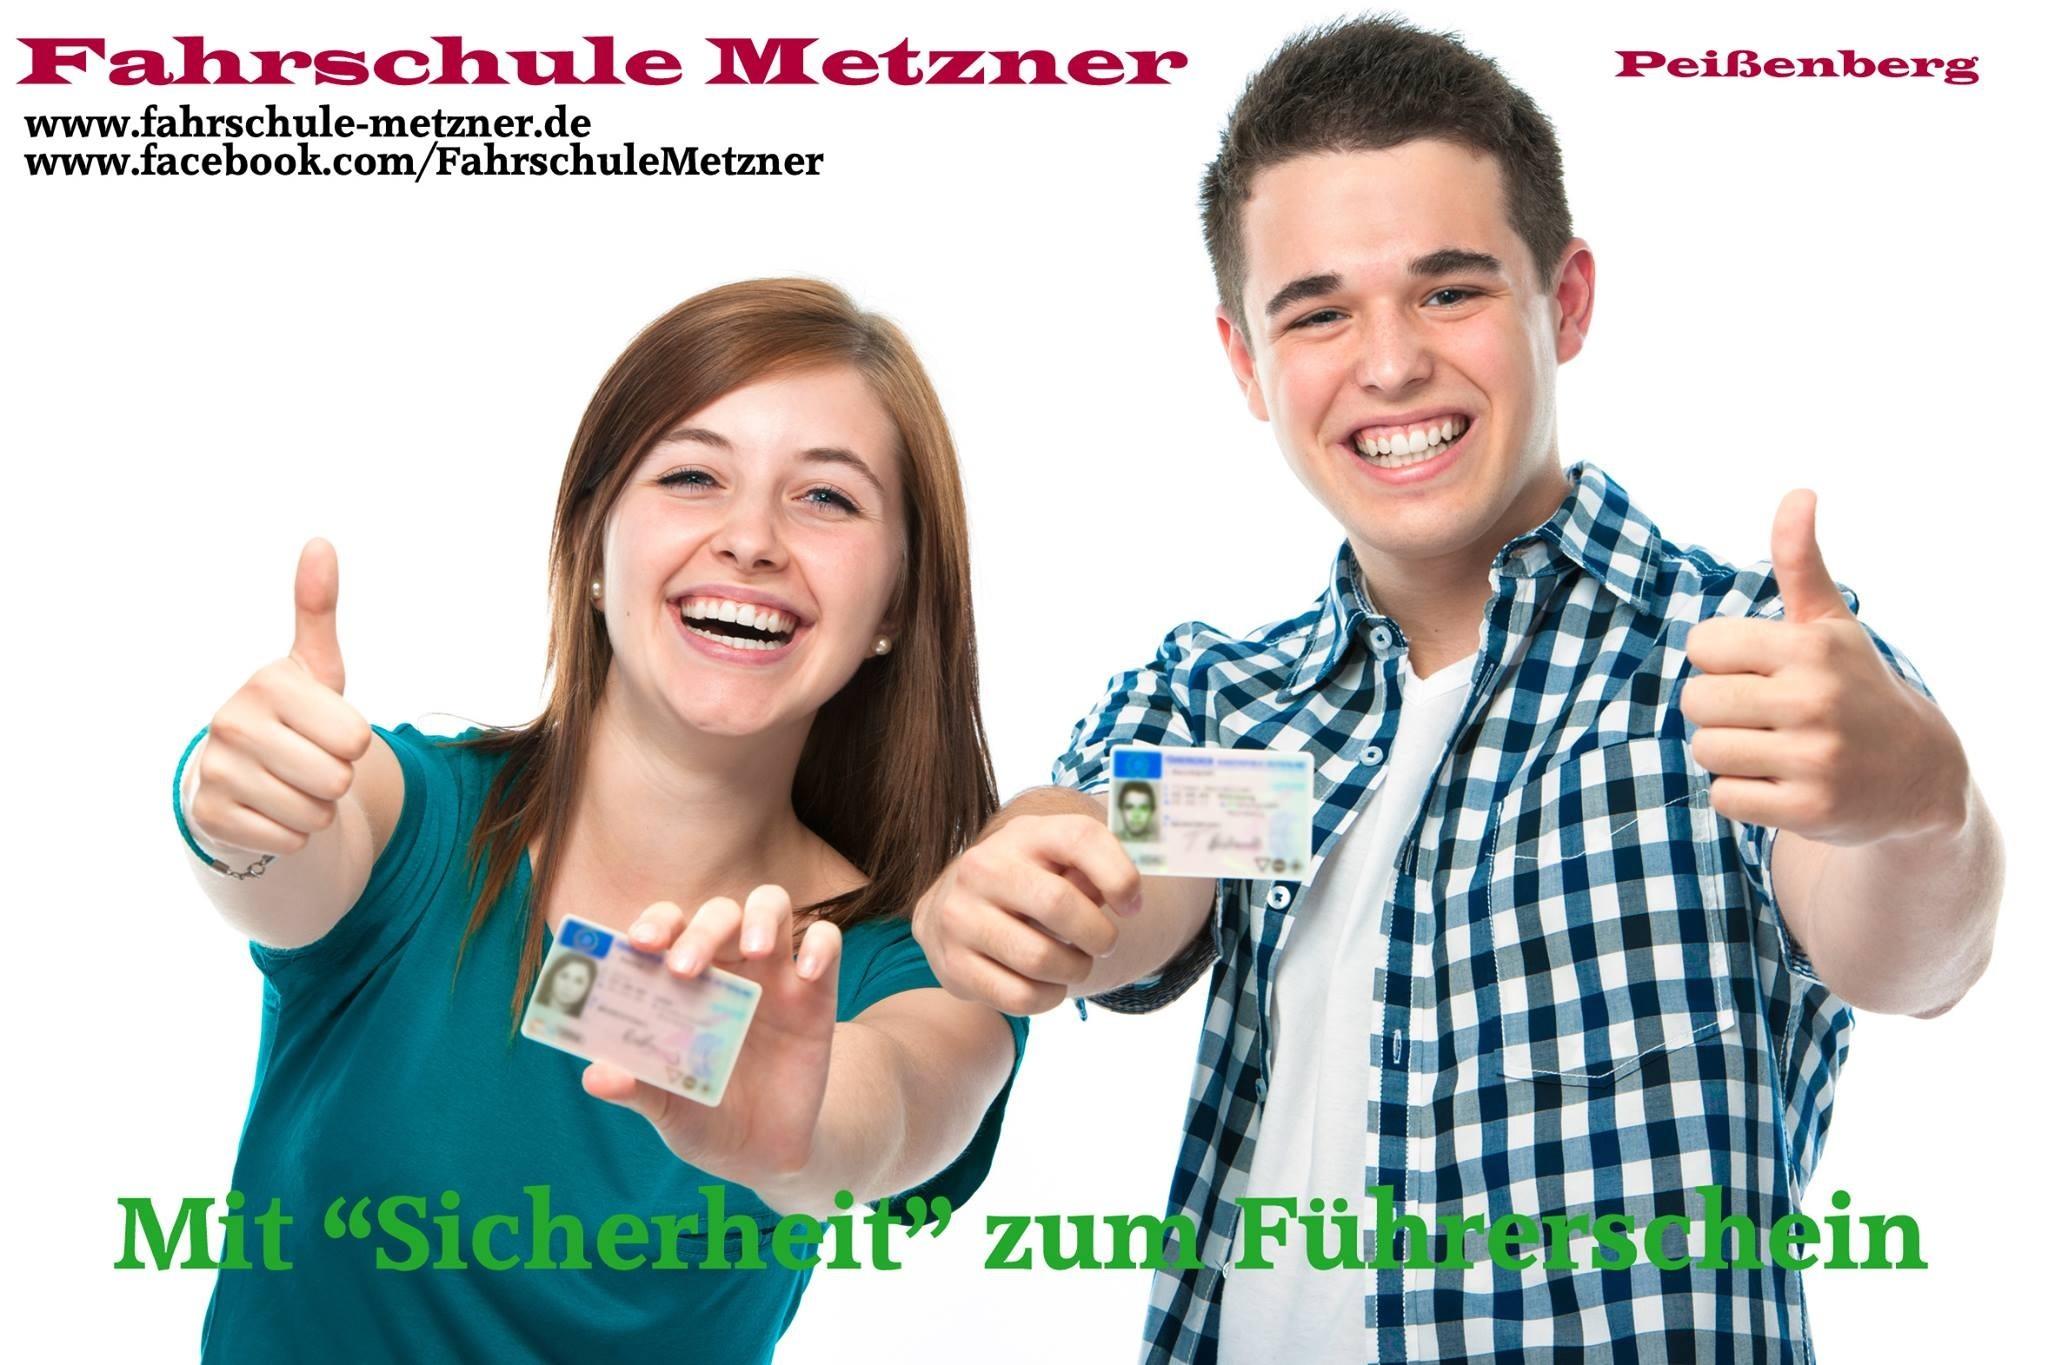 Metzner Andreas Fahrschule